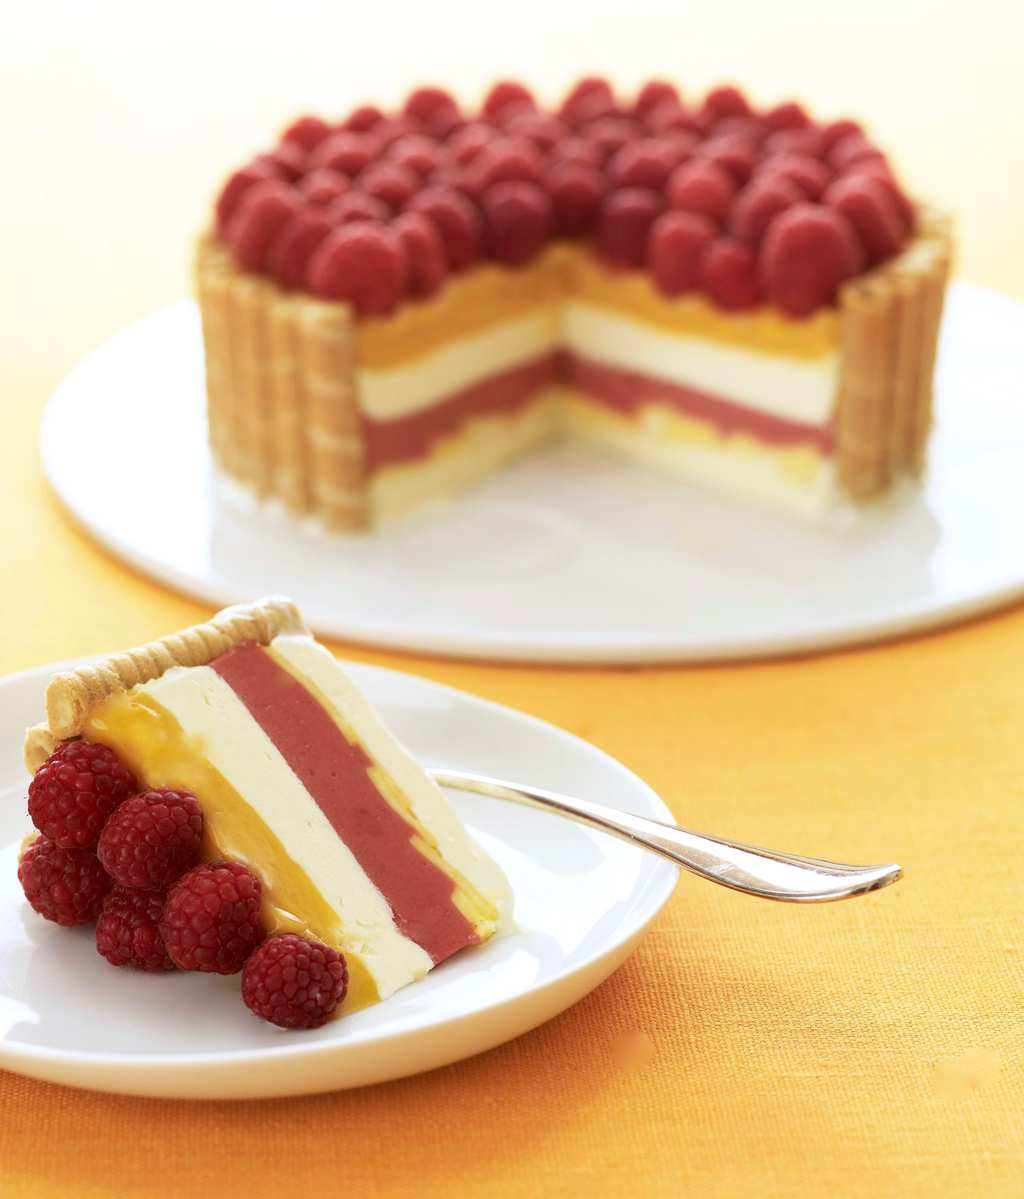 Tara Teaspoon layered icebox dessert with raspberries and mangos